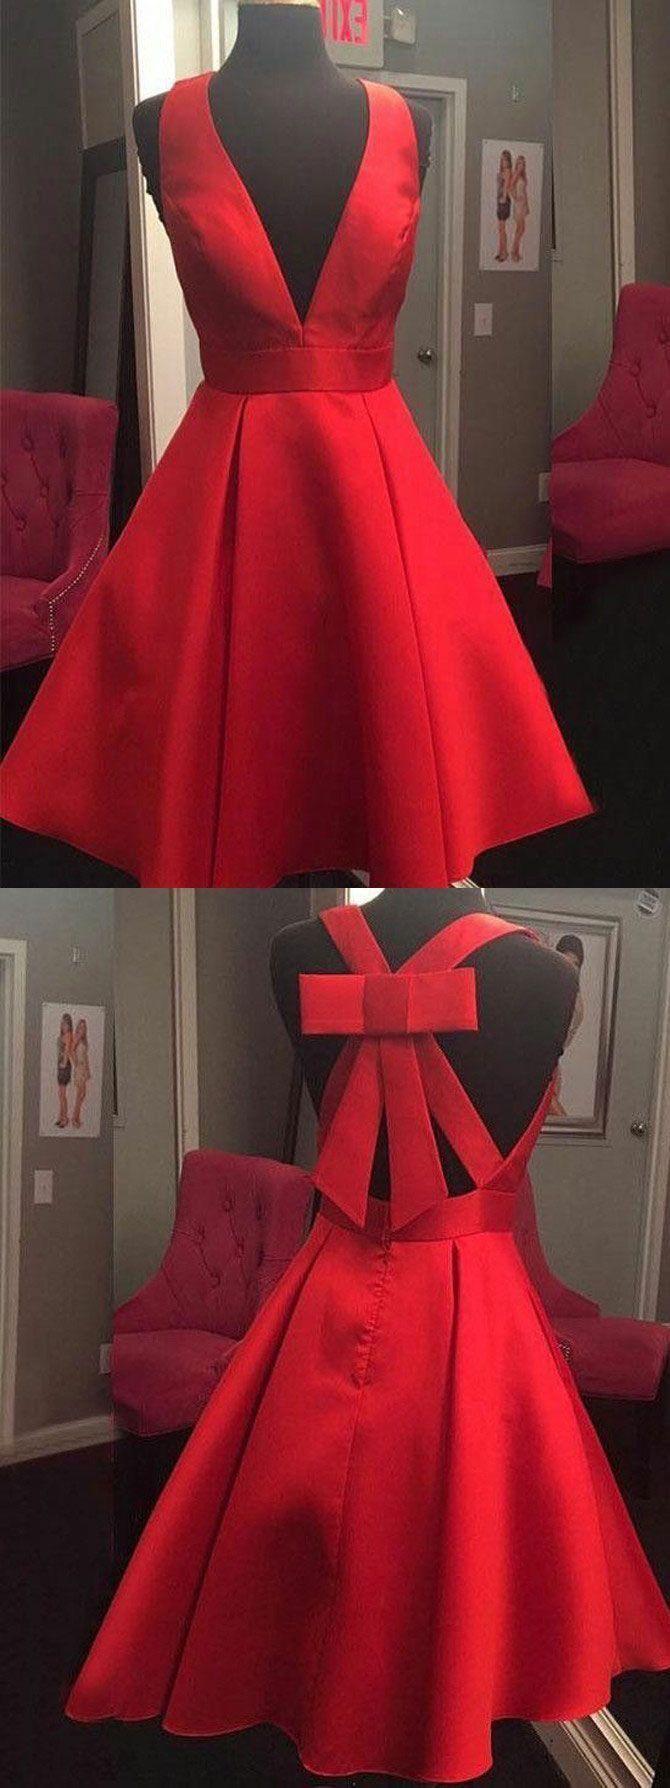 Red Satin Short Homecoming Dress, Prom Dress H3397